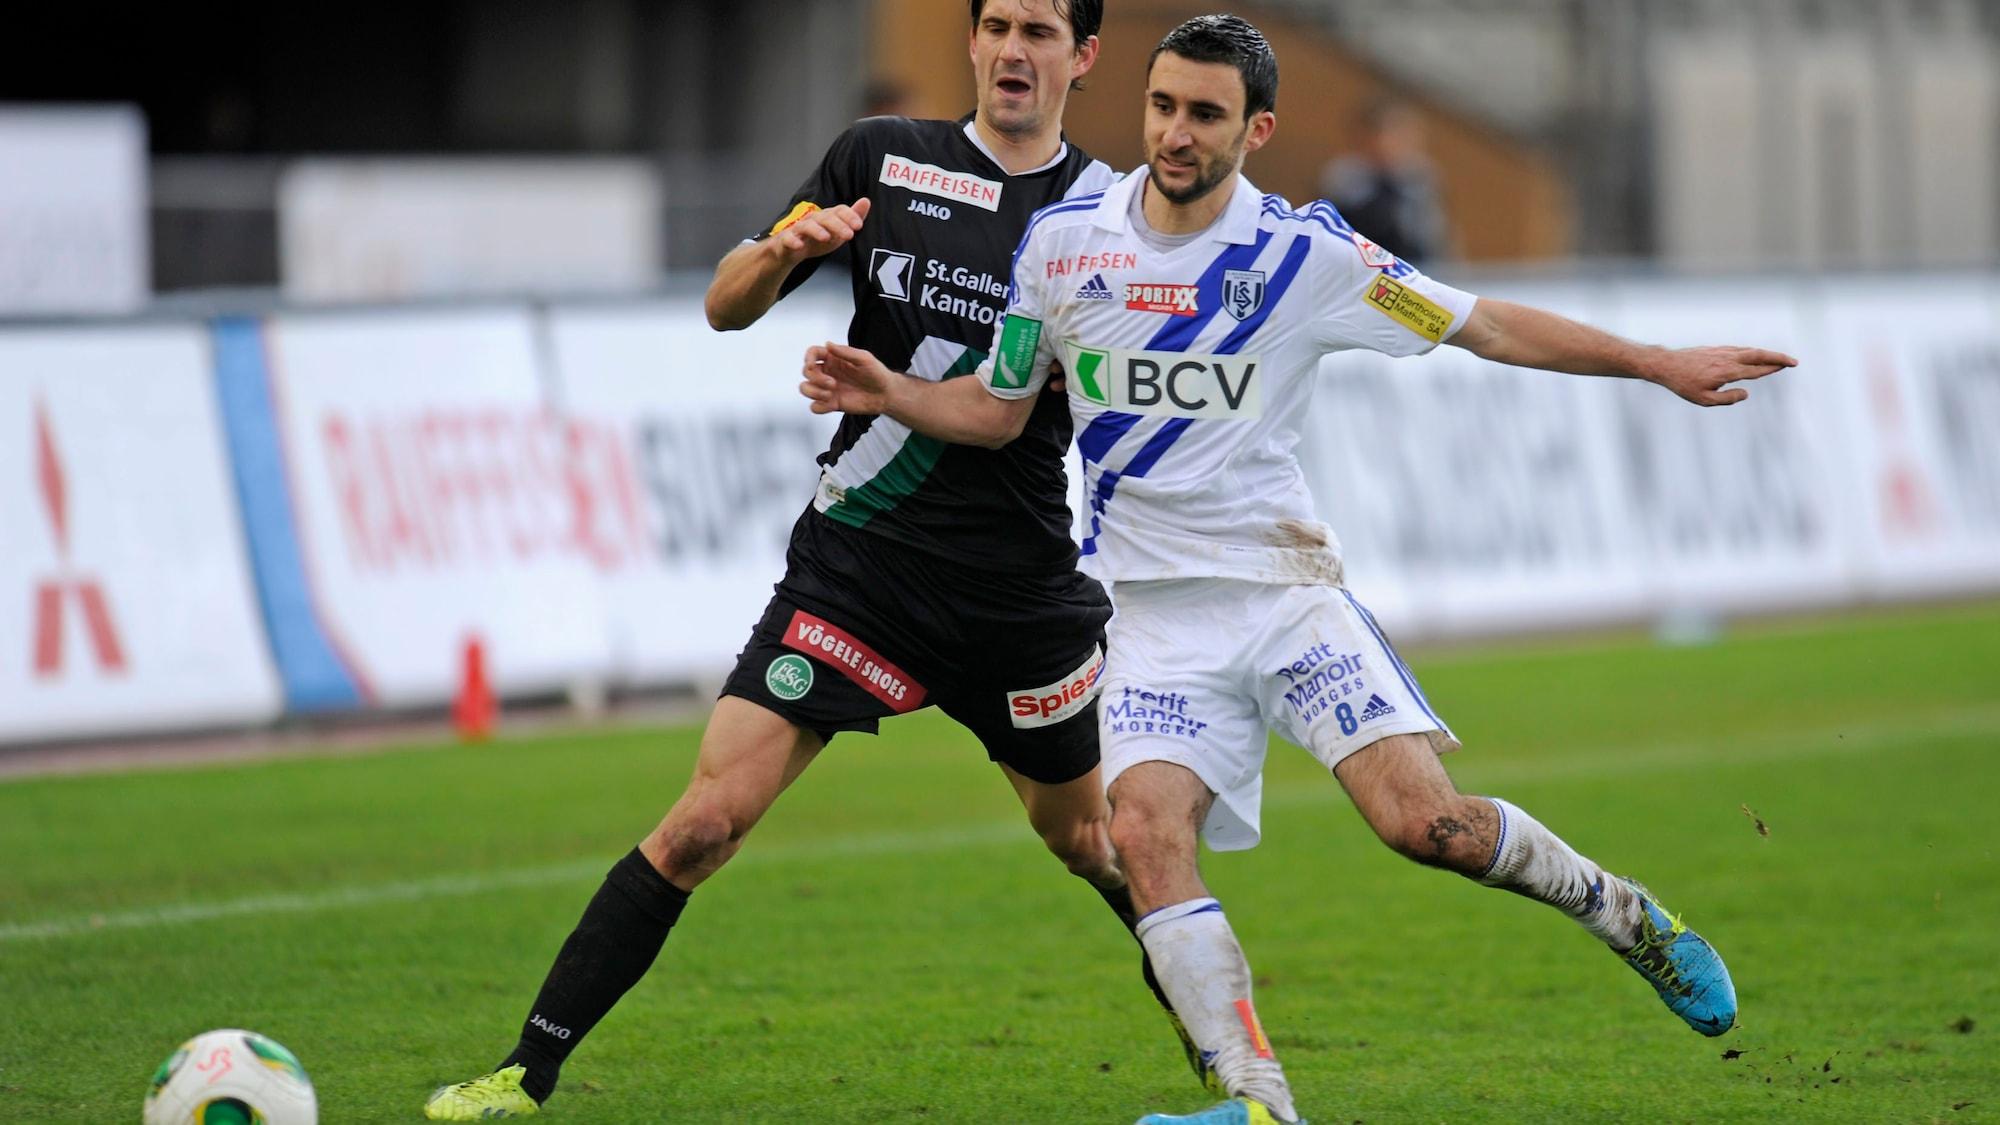 Old Boys beim FC Meyrin: Drei langjährige Super-League-Spieler fordern den FCB